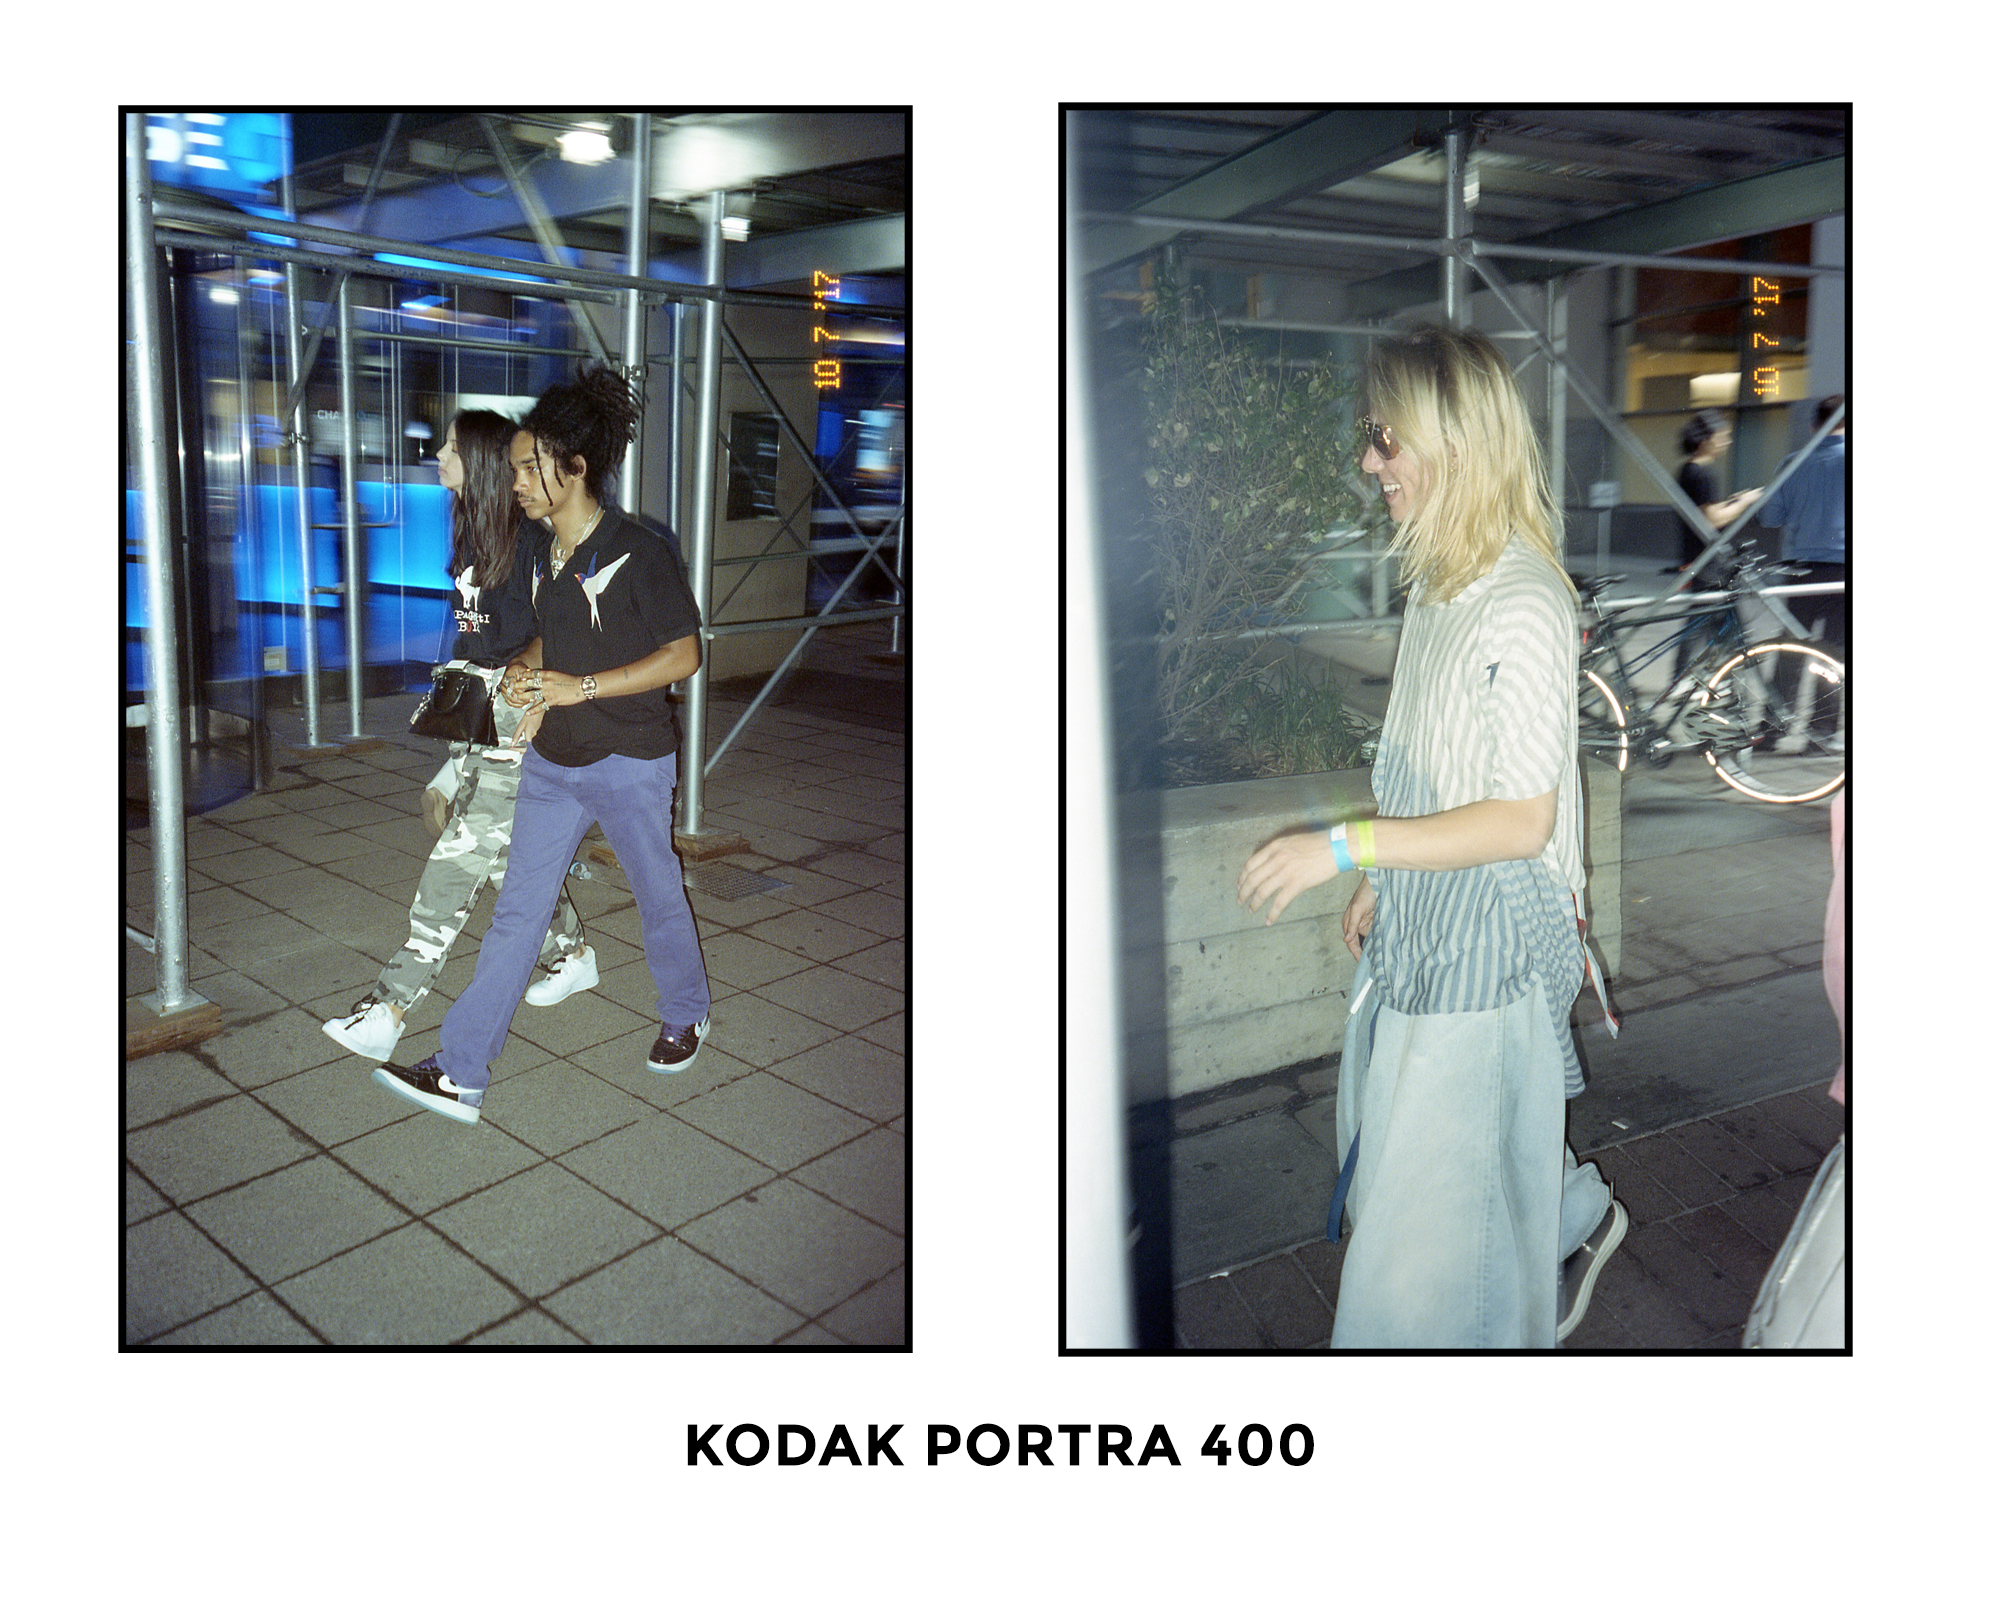 5 - Kodak Portra 400 vs. Kodak PortrA 800 - FILTERGRADE BLOG